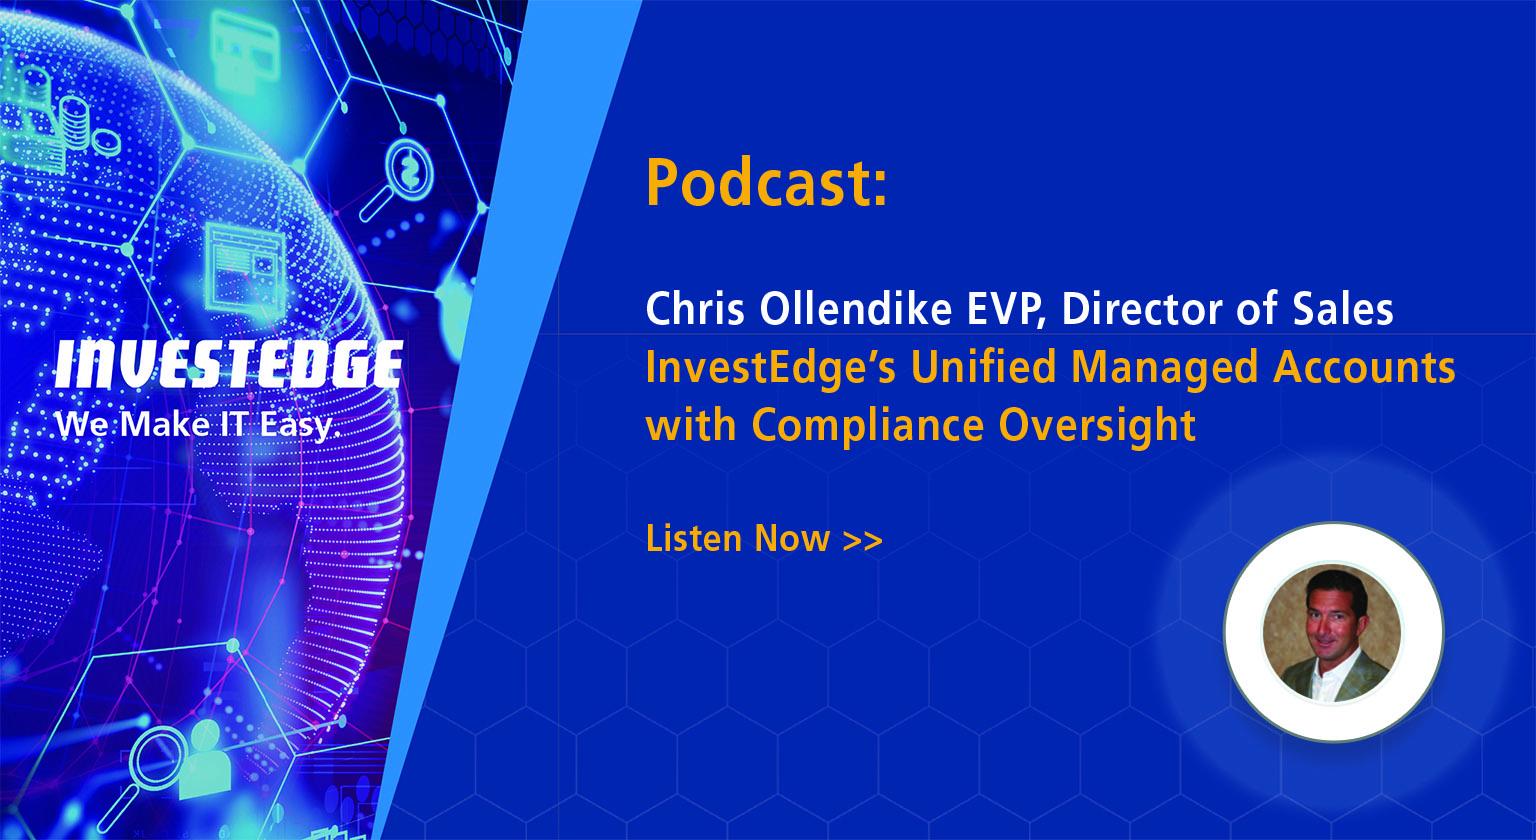 UMAs with Compliance Oversight